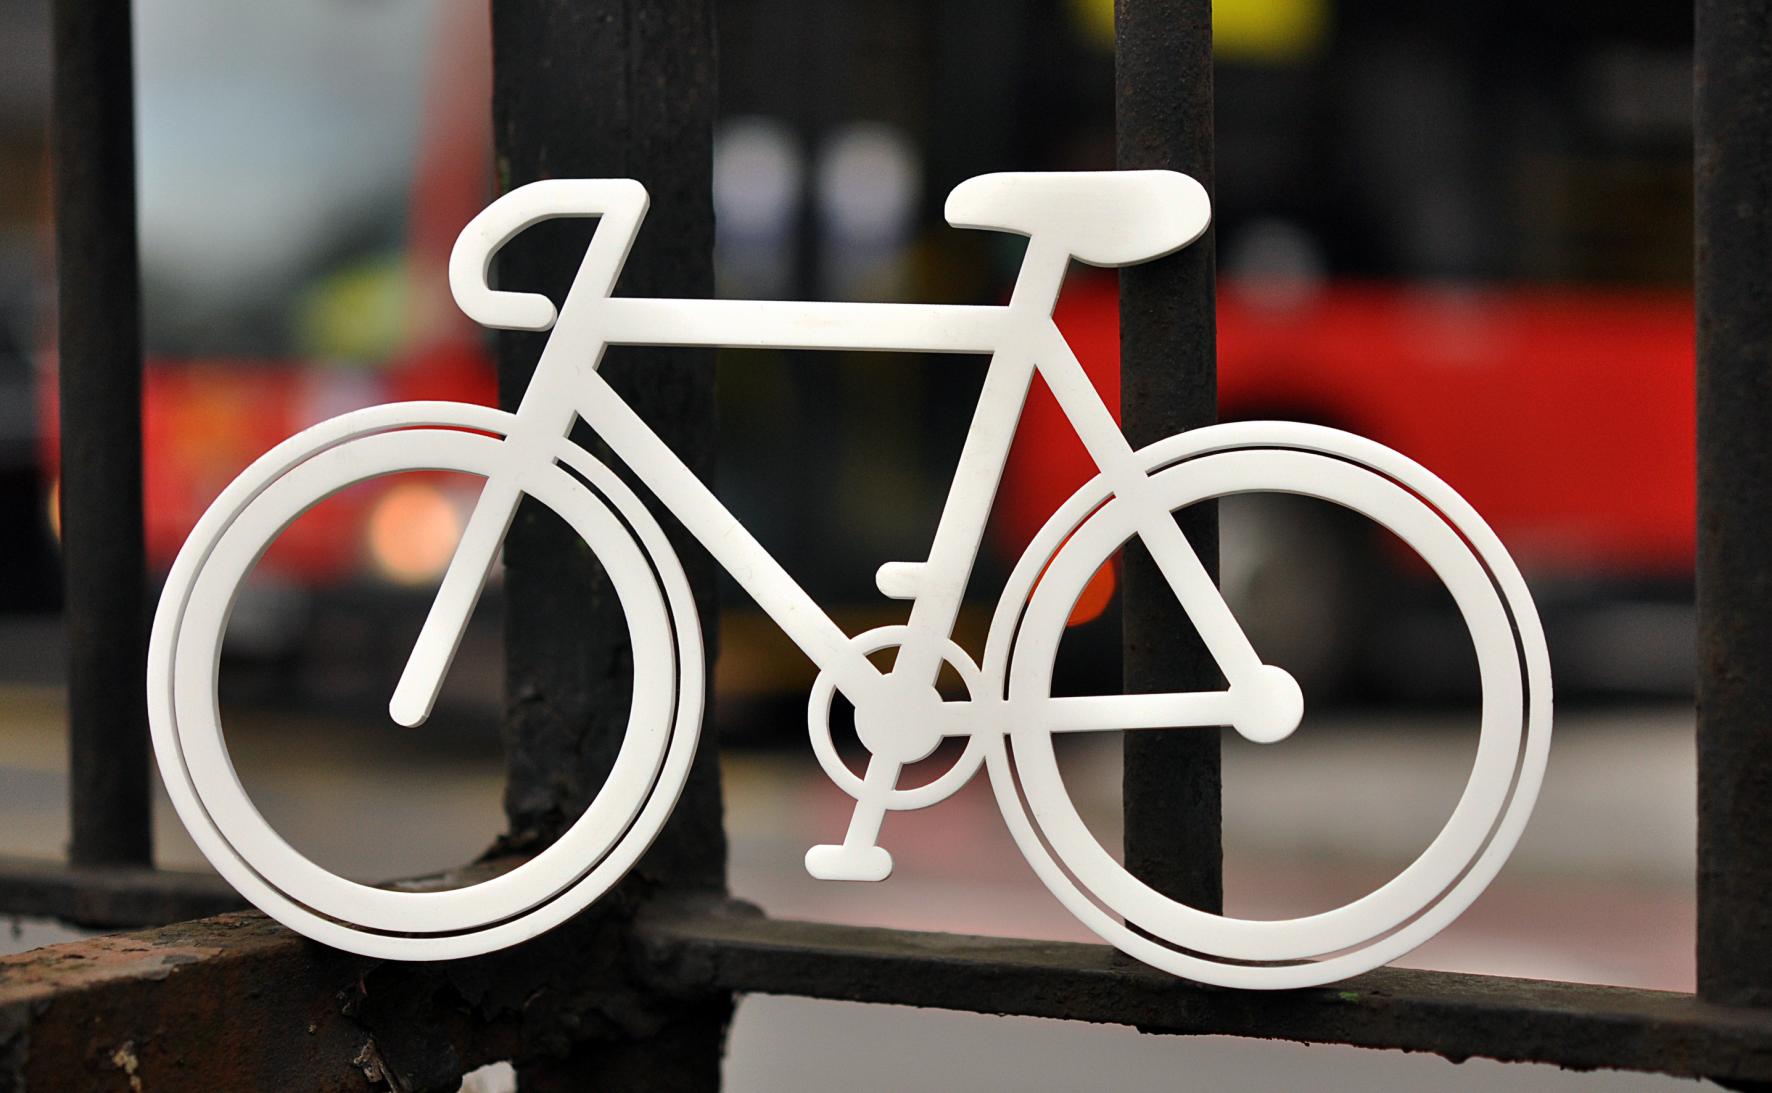 White Bike - Tower Bridge Road Junction.